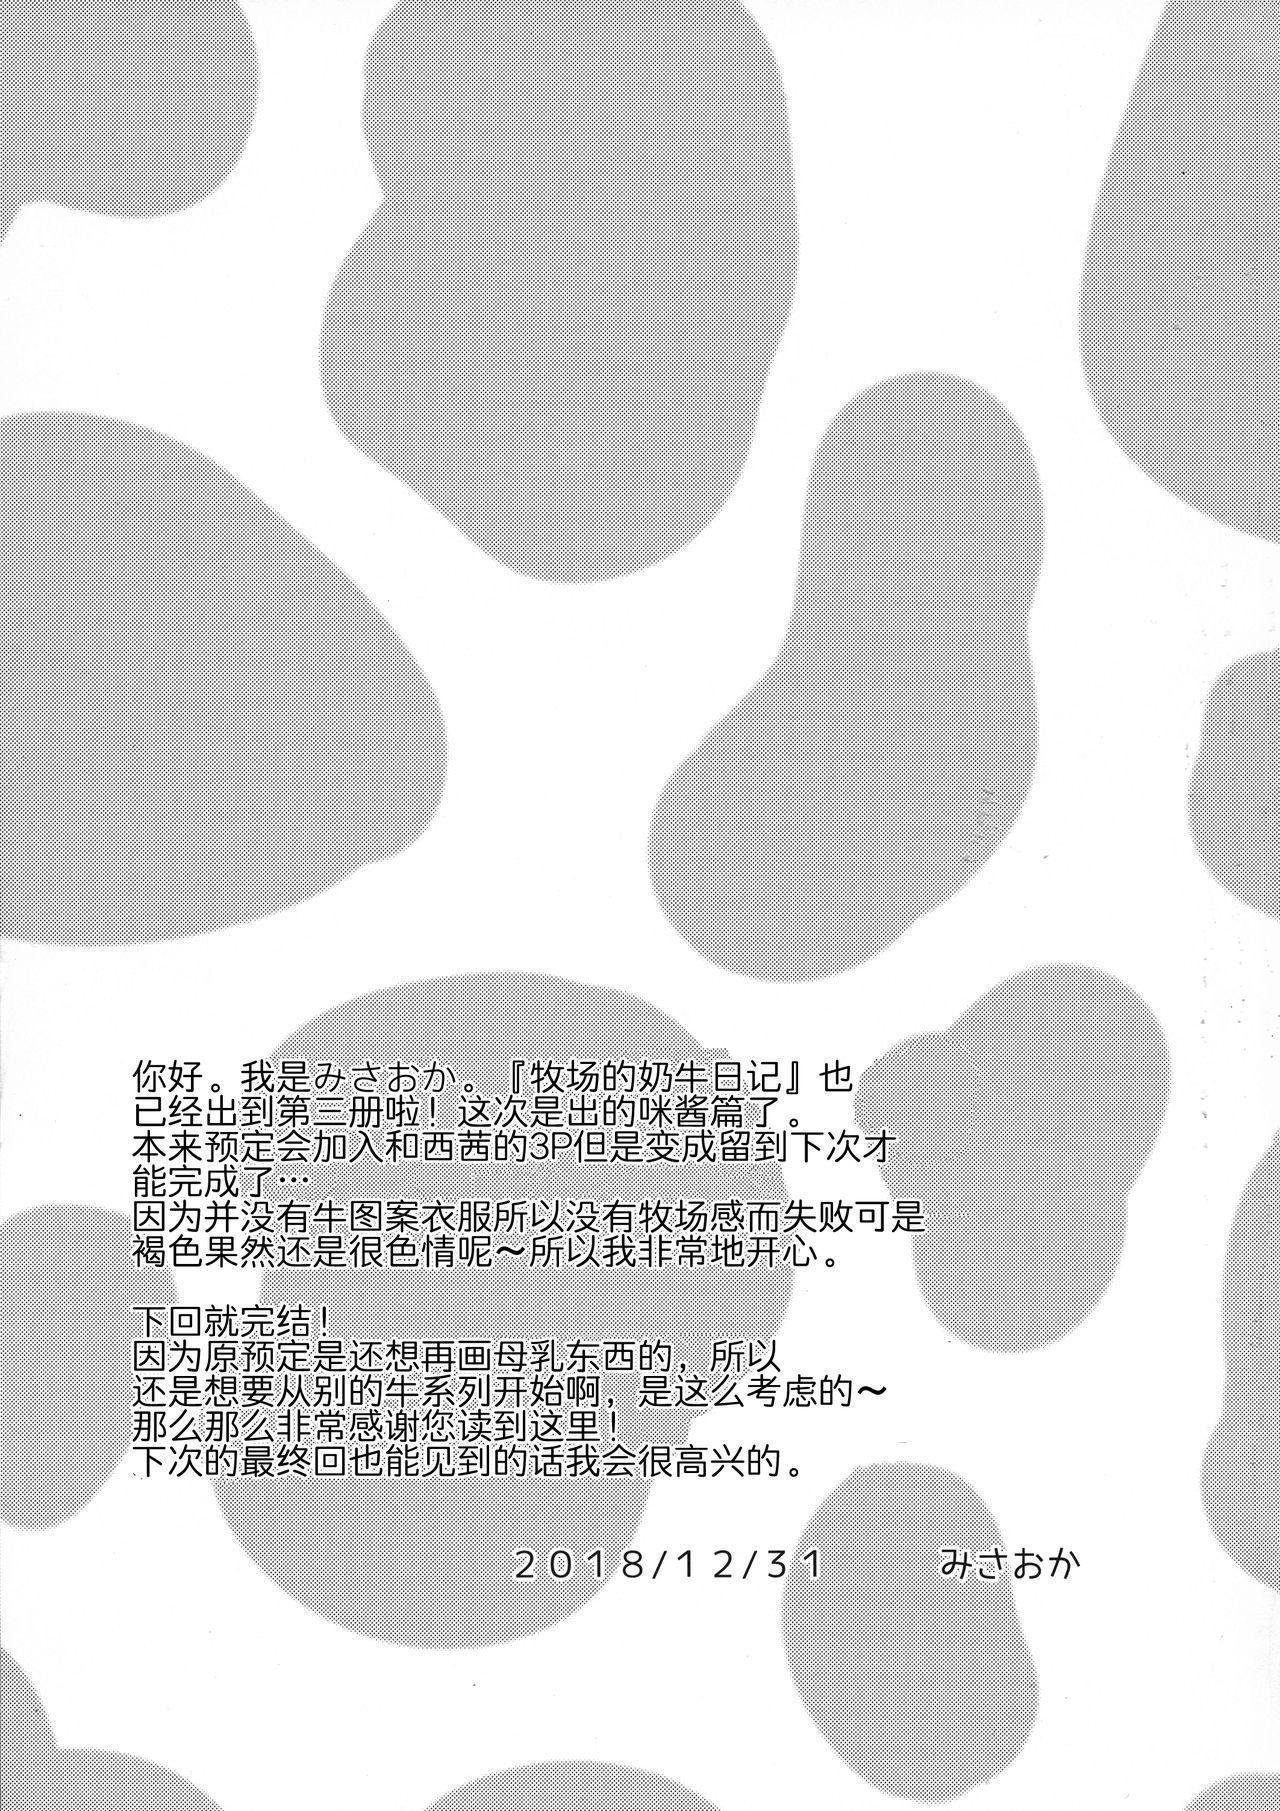 Makiba no Bonyuu Nikki ♡♡ 3 22